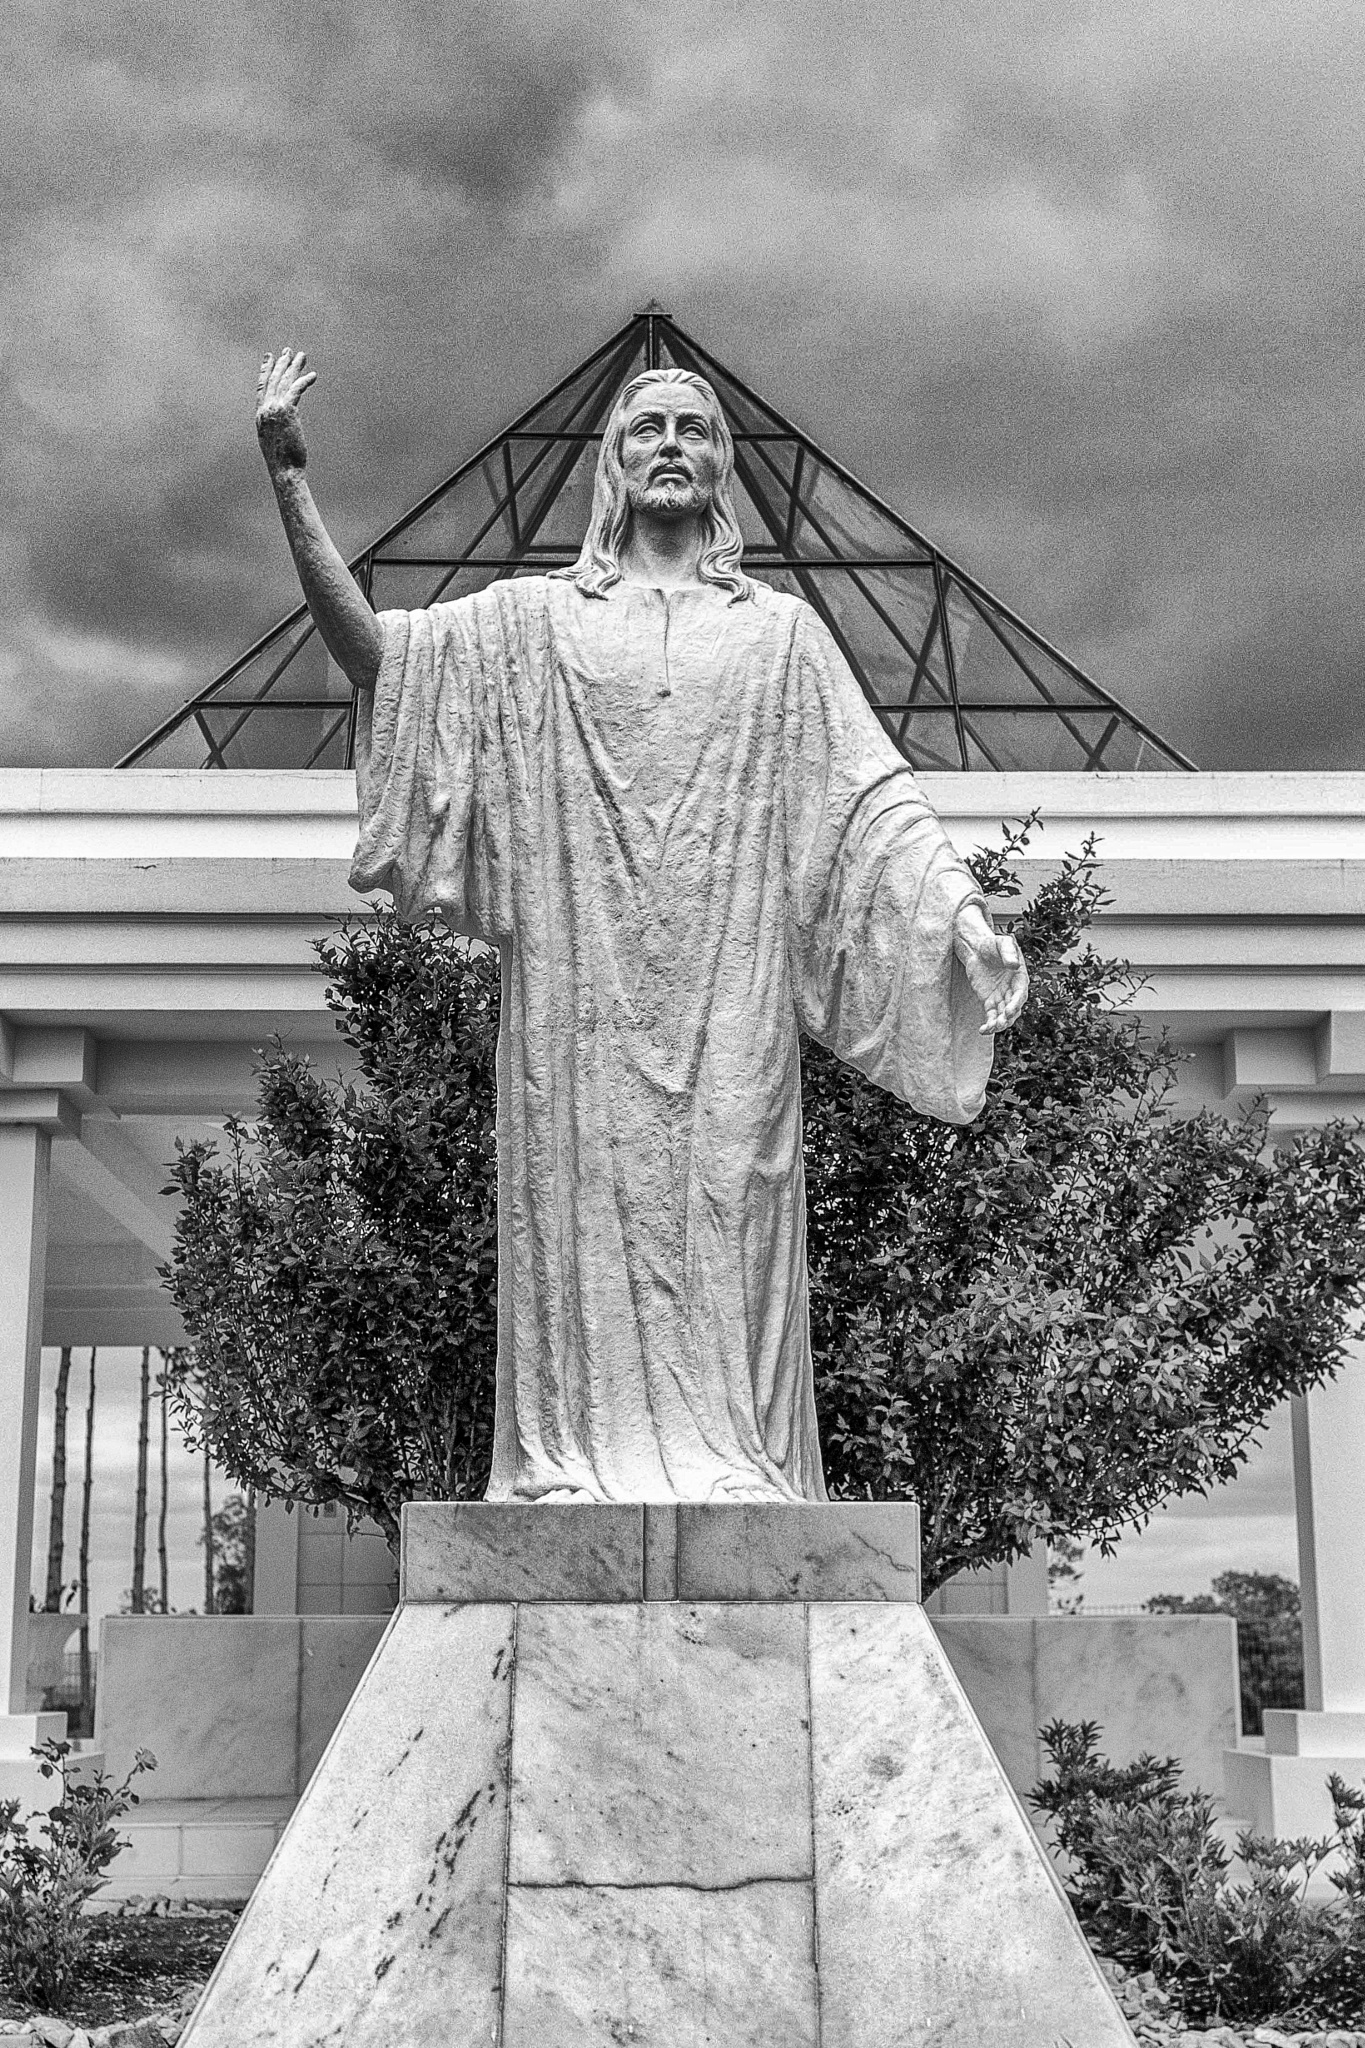 Santuario Piraju Nicola by williancorrea